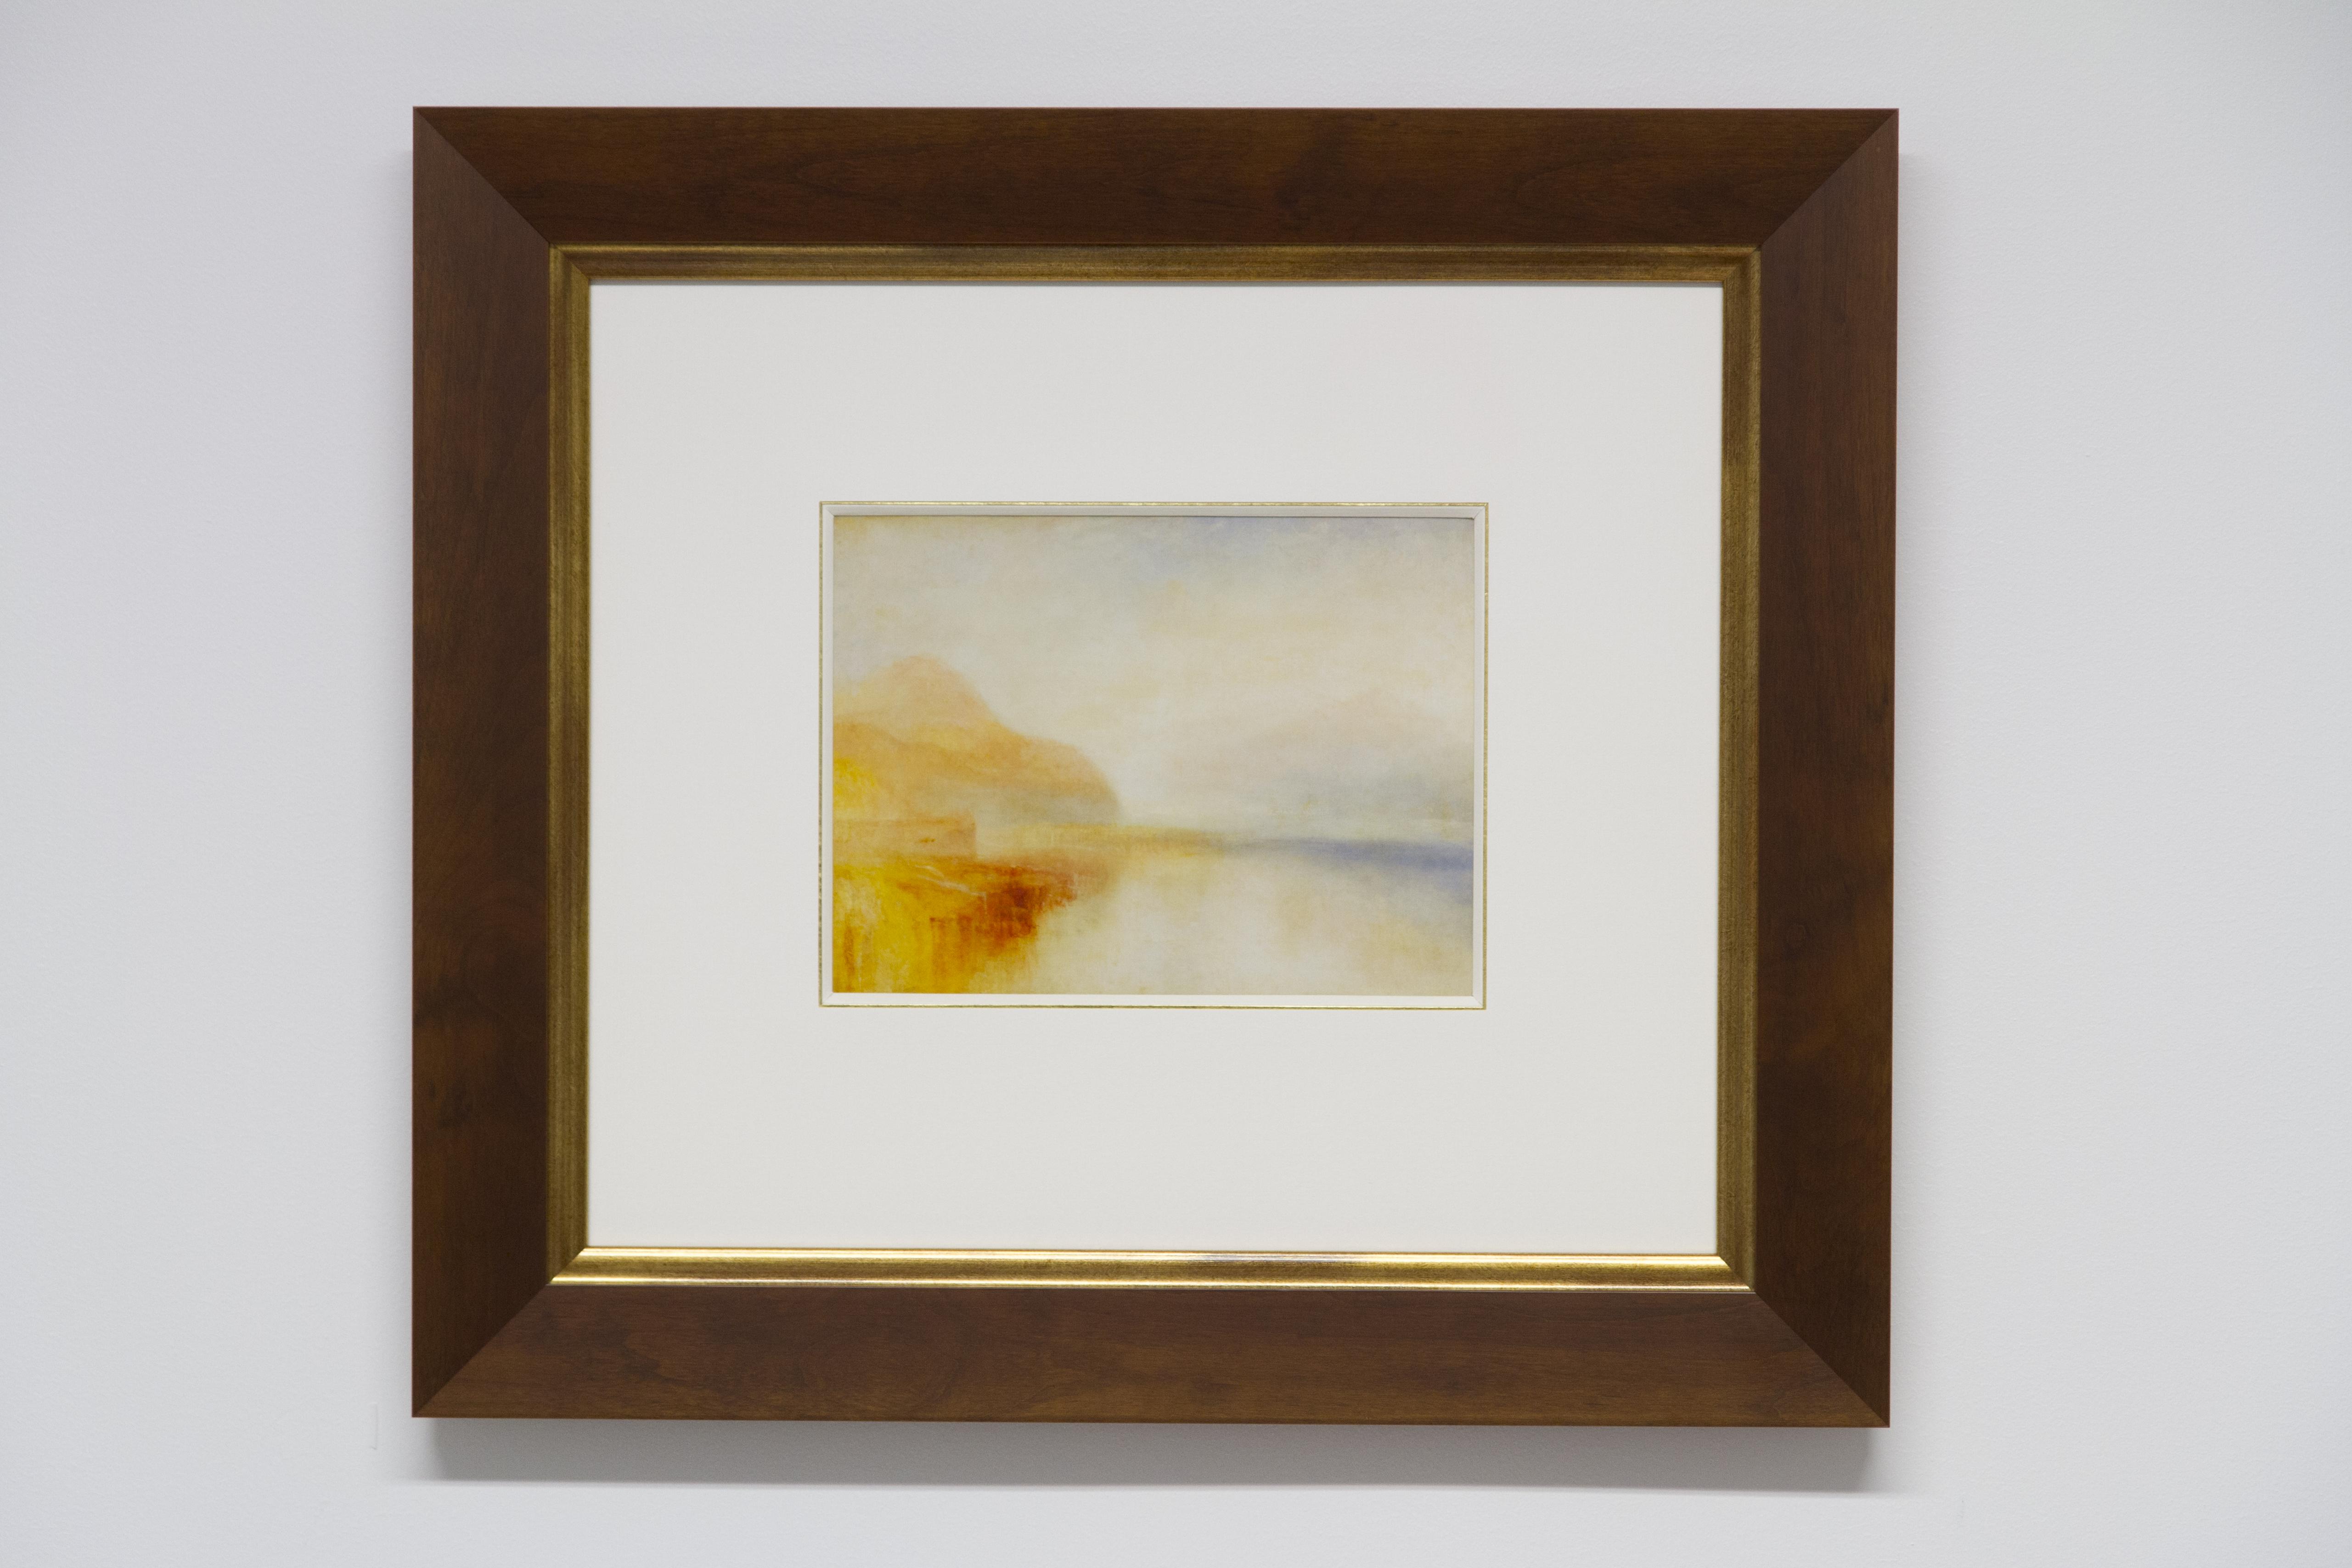 Inverary Pier, Loch Fyne: Morning - William Turner - Royaume-Uni, 1835